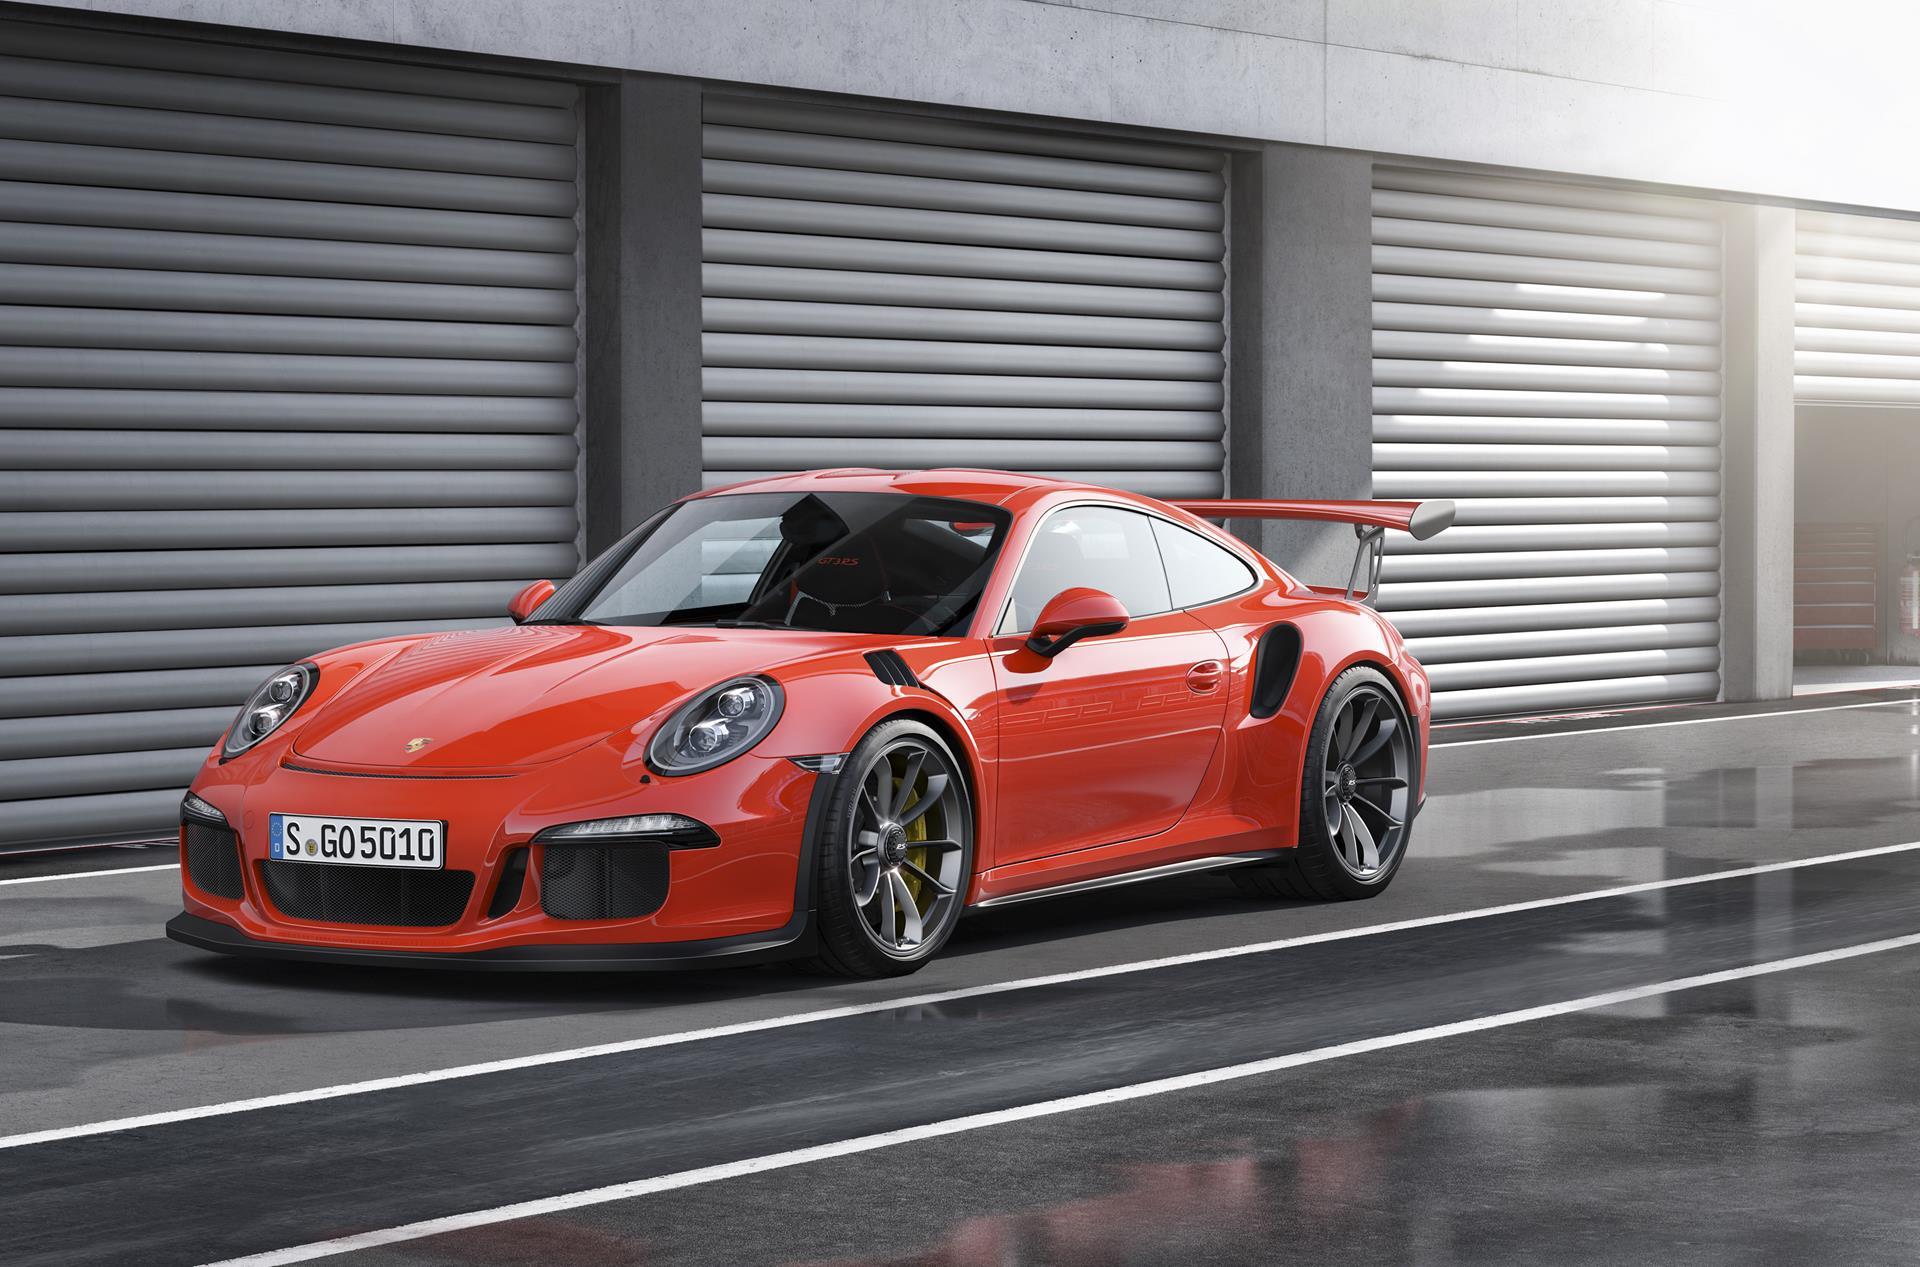 2015 Porsche 911 Gt3 News And Information Conceptcarz Com